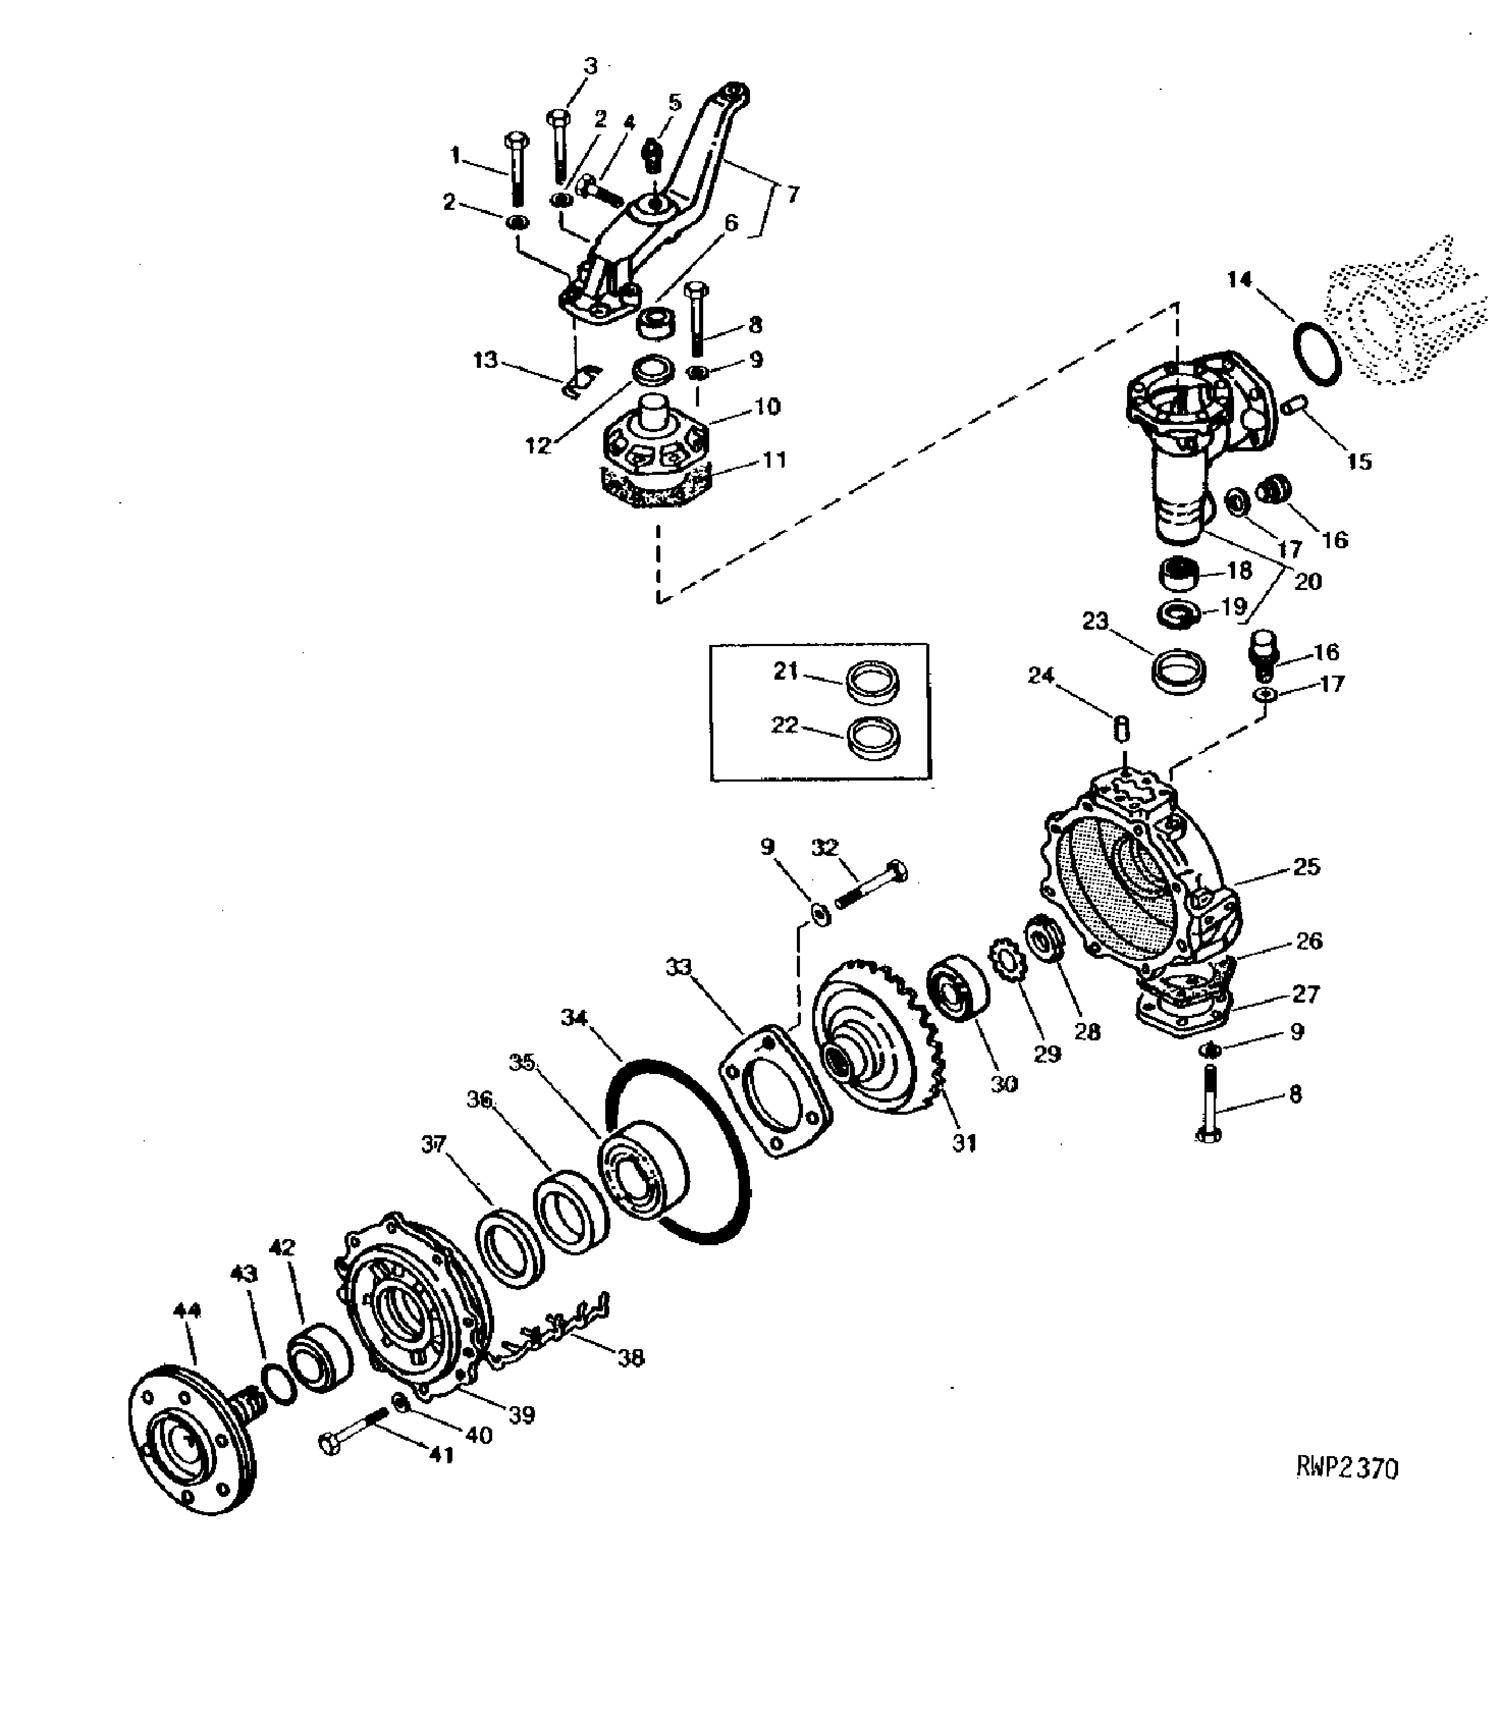 John Deere 855 Tractor Wiring Diagram Trusted L118 L20 5310